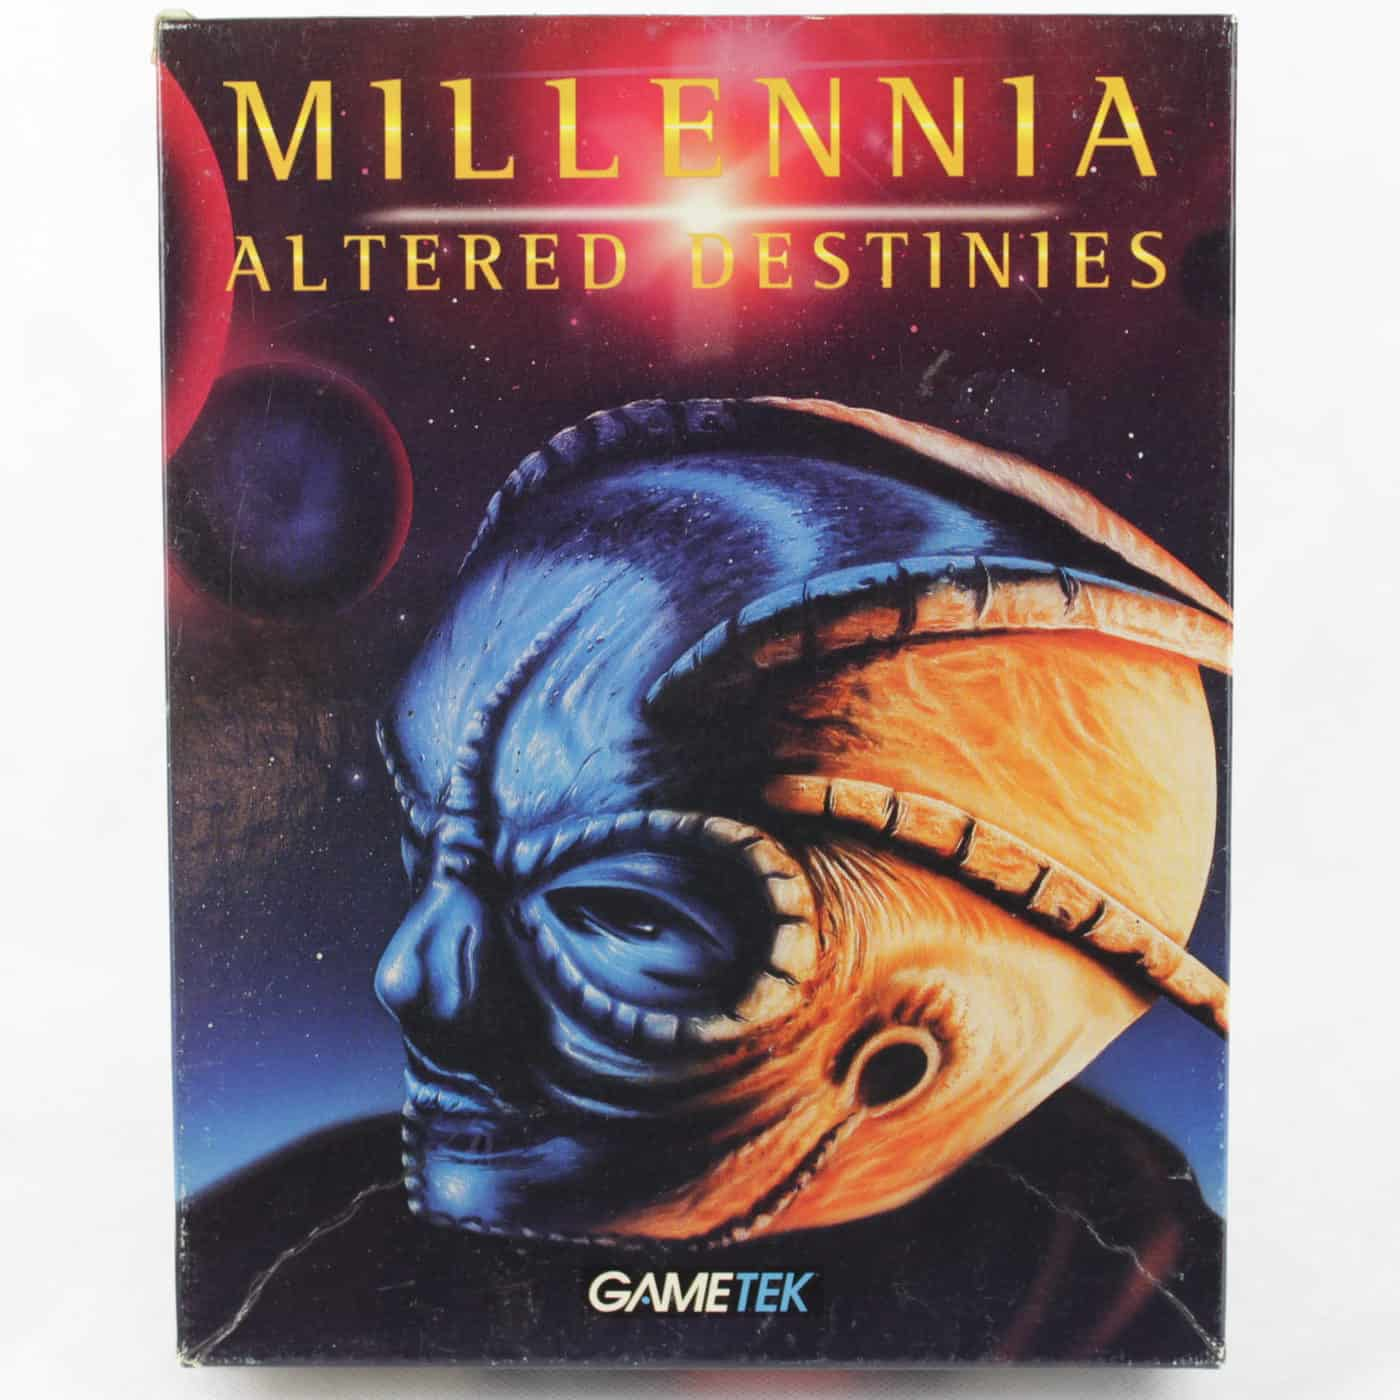 Millennia: Altered Destinies (PC Big Box, 1995, DOS, CD-ROM, Take-Two)